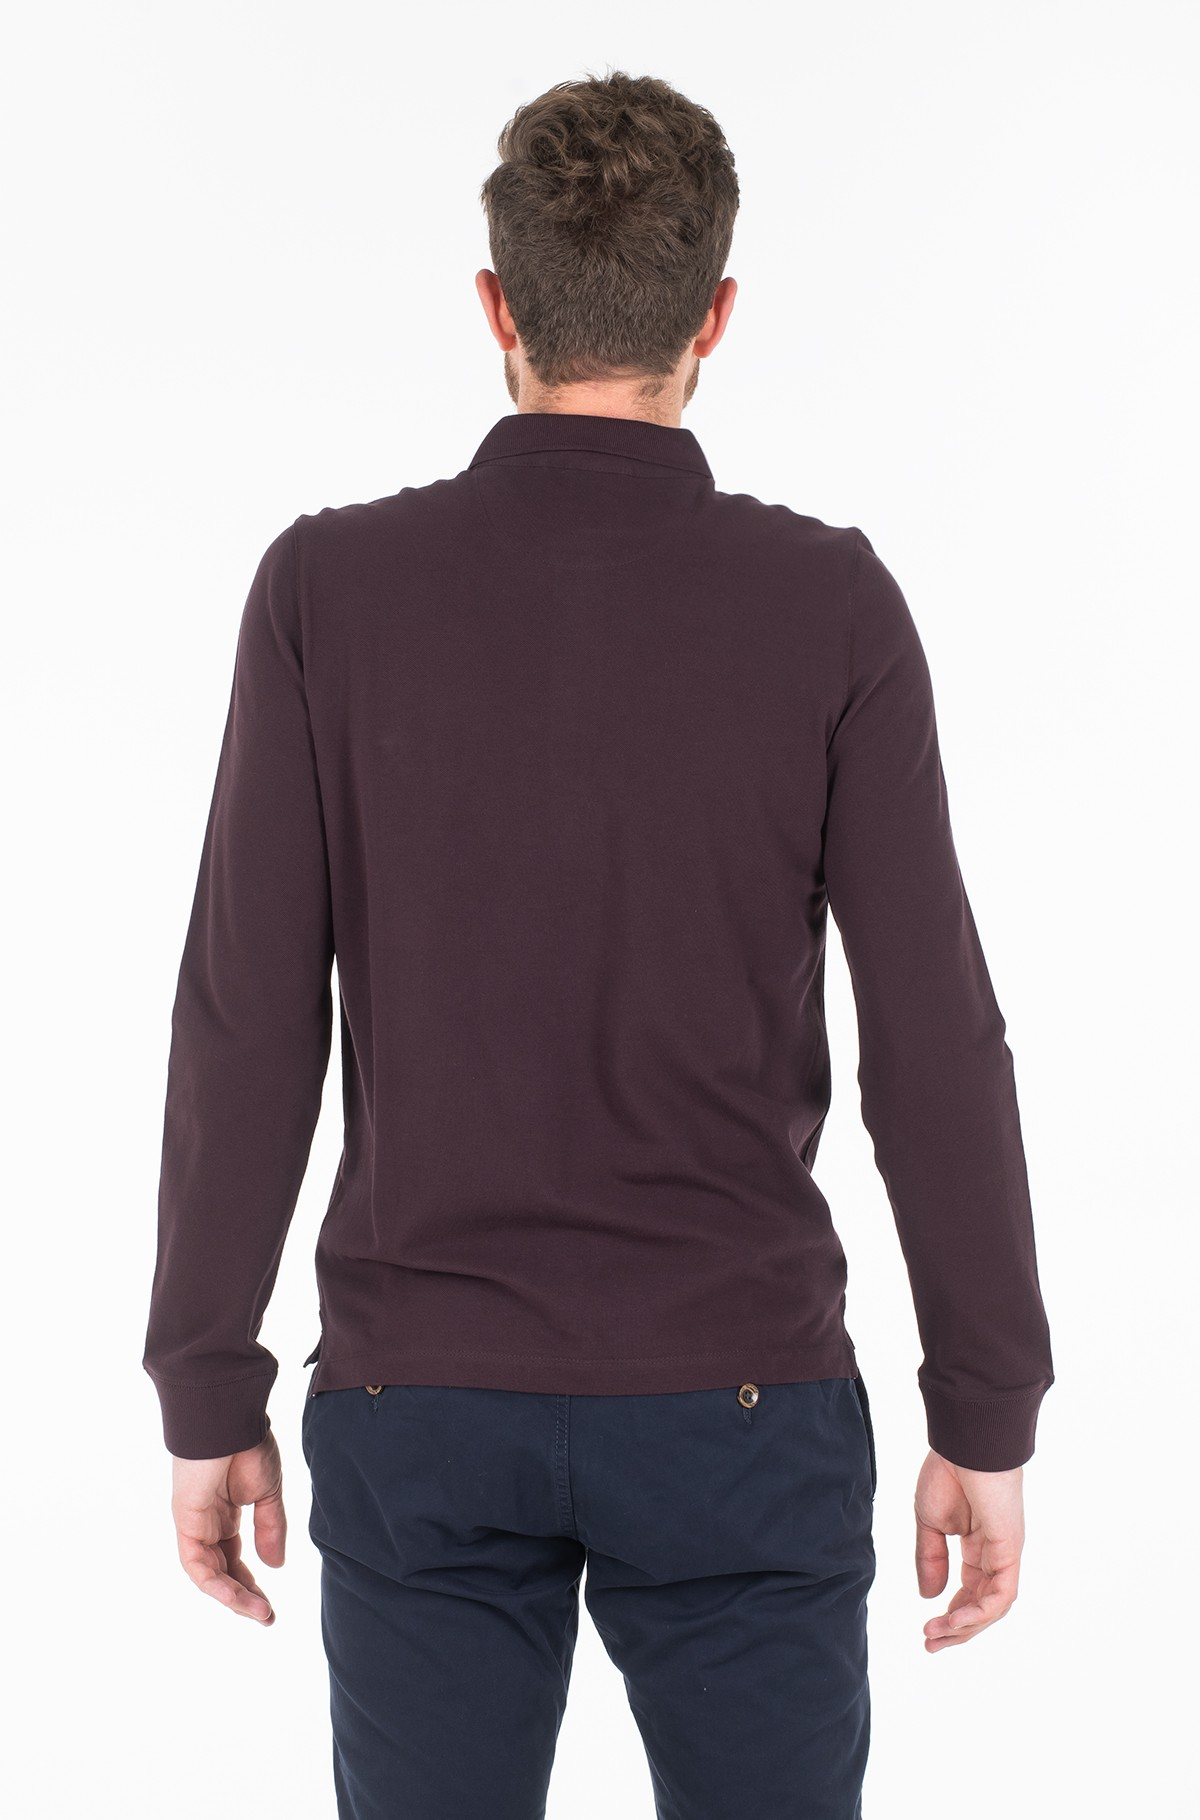 Polo marškinėliai ilgomis rankovėmis 31.128086-full-2